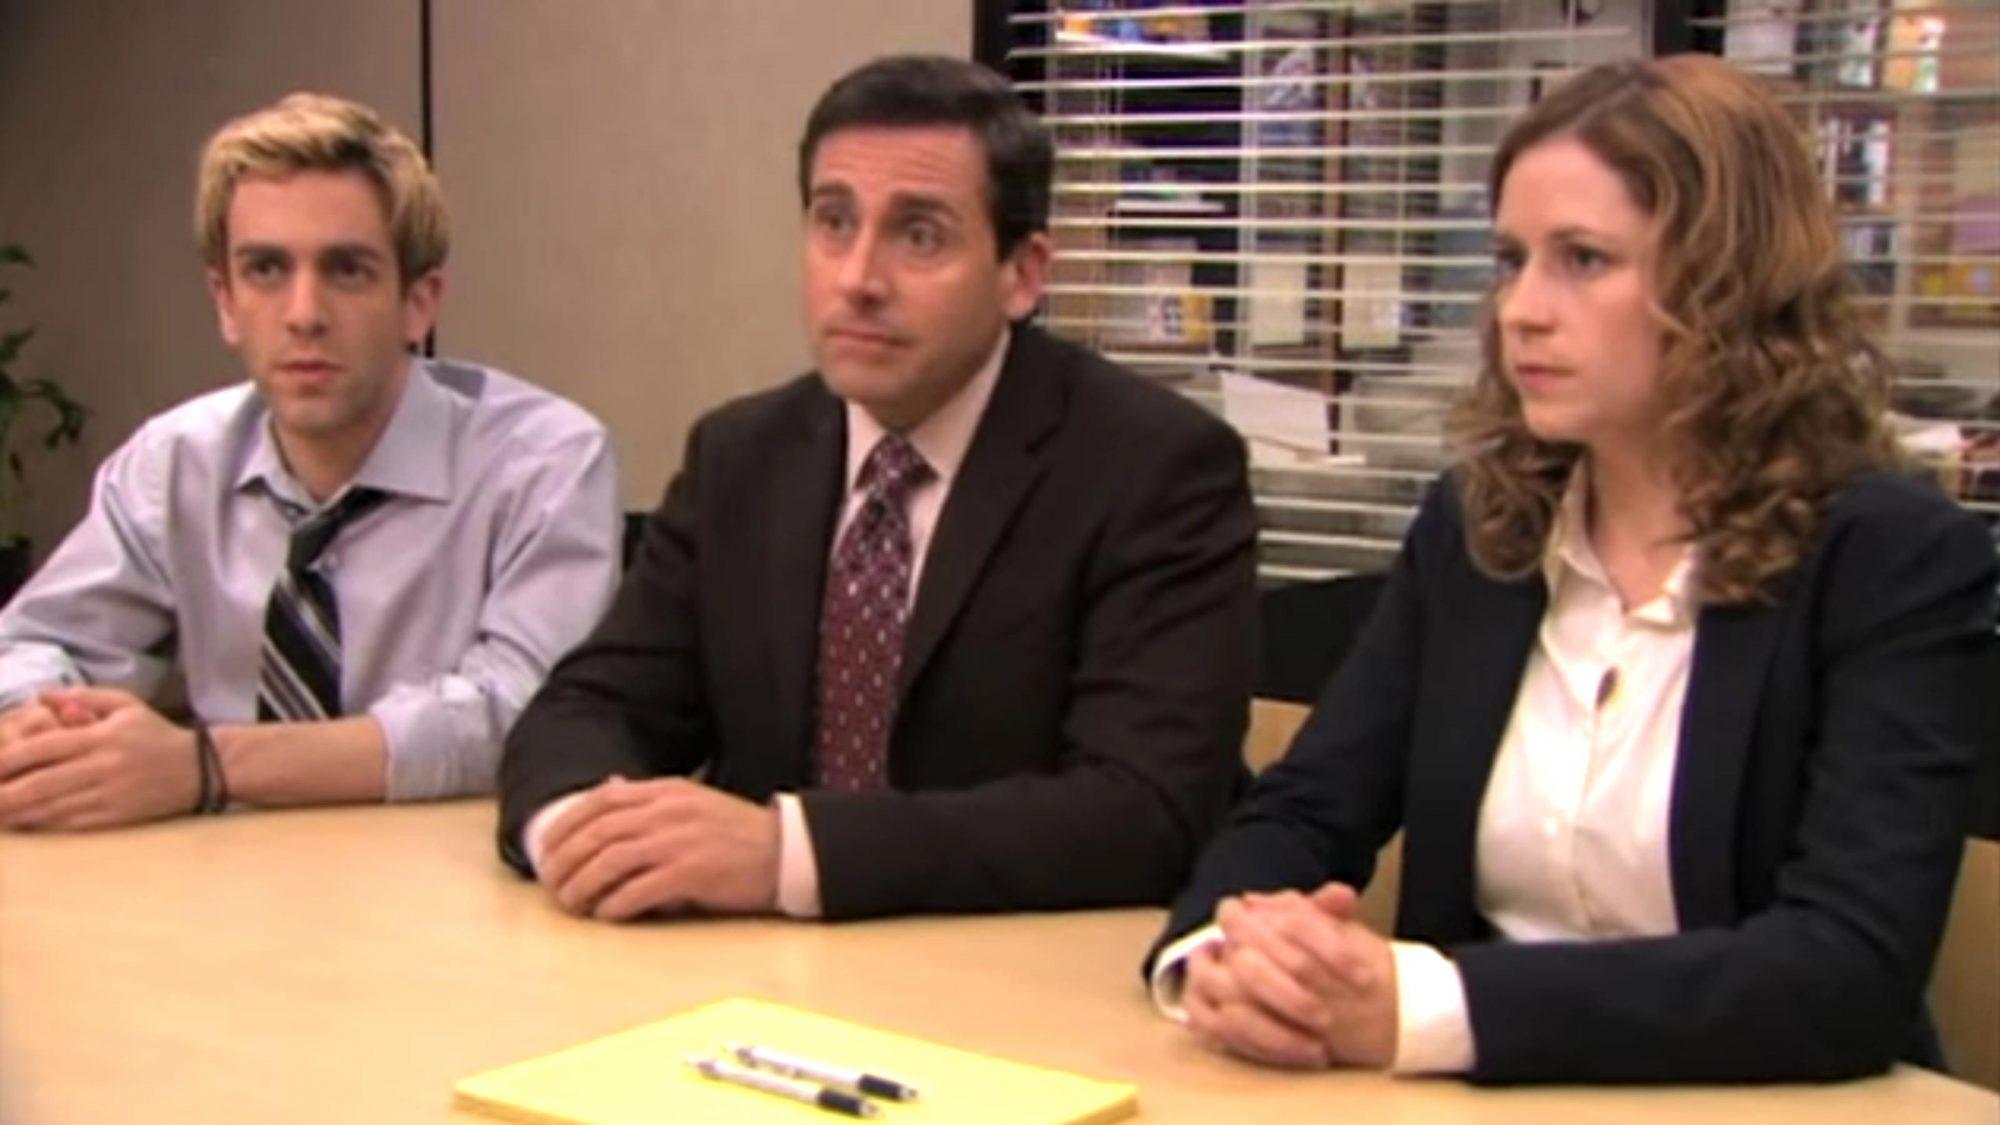 The Office - Broke (Episode Highlight) Season 5, Episode 25 (screen grab) BJ Novak, Steve Carell and Jenna Fischer https://www.youtube.com/watch?v=363ra3VGiGA CR: NBC